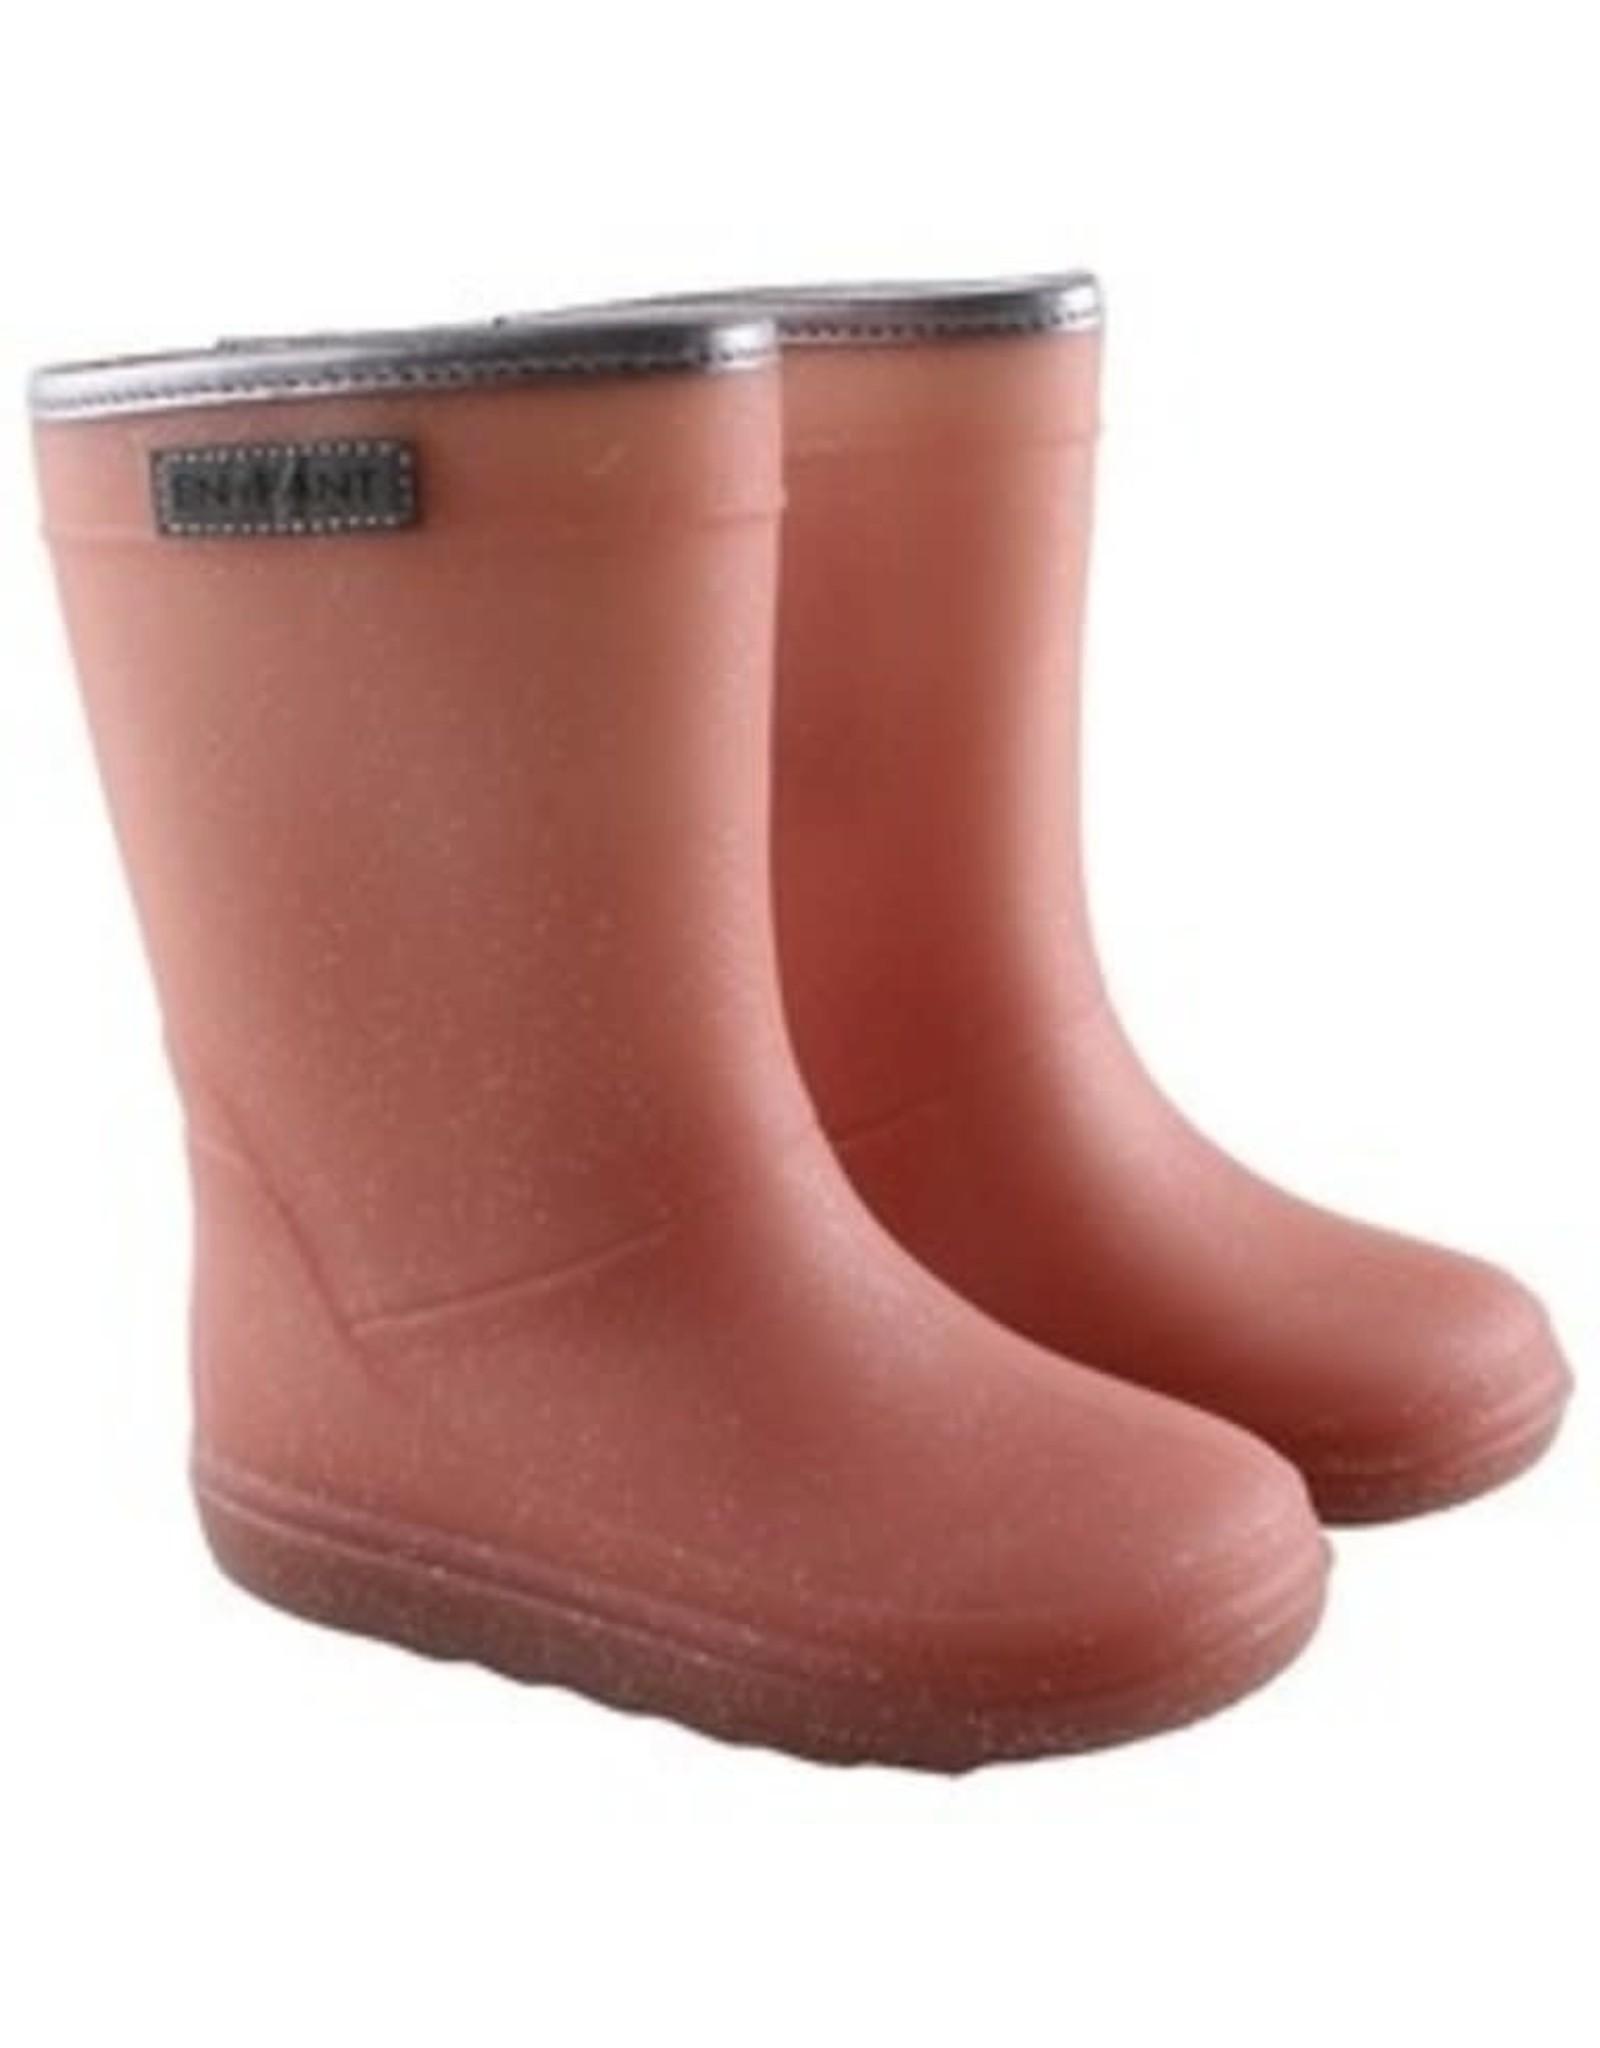 Enfant Thermo boot - Metallic Rose